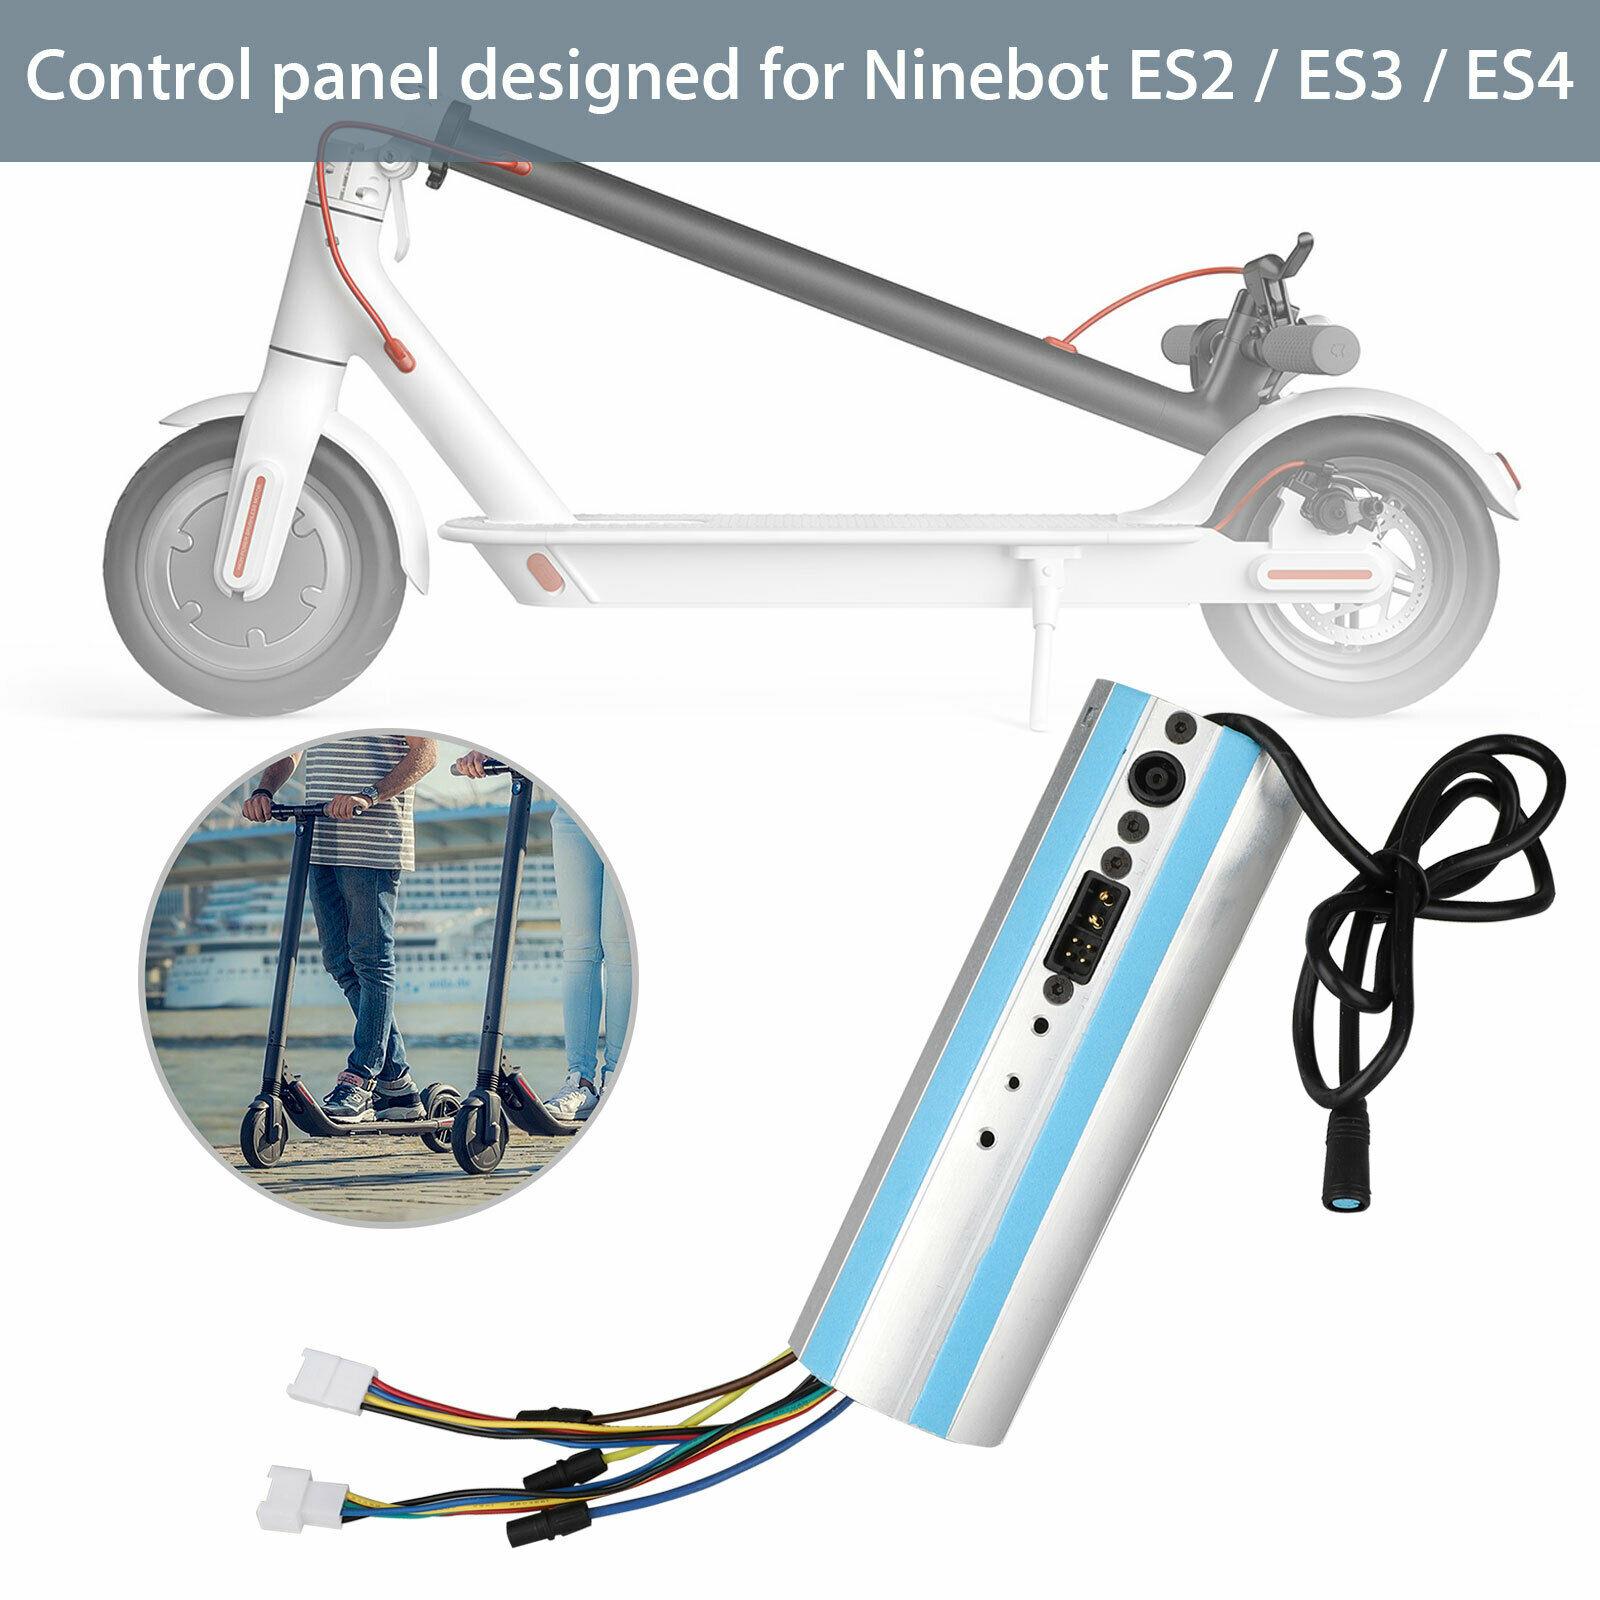 Vervanging Voor Ninebot Segway ES1/ES2/ES3/ES4 Scooter Activated Bluetooth Dashboard Control Board